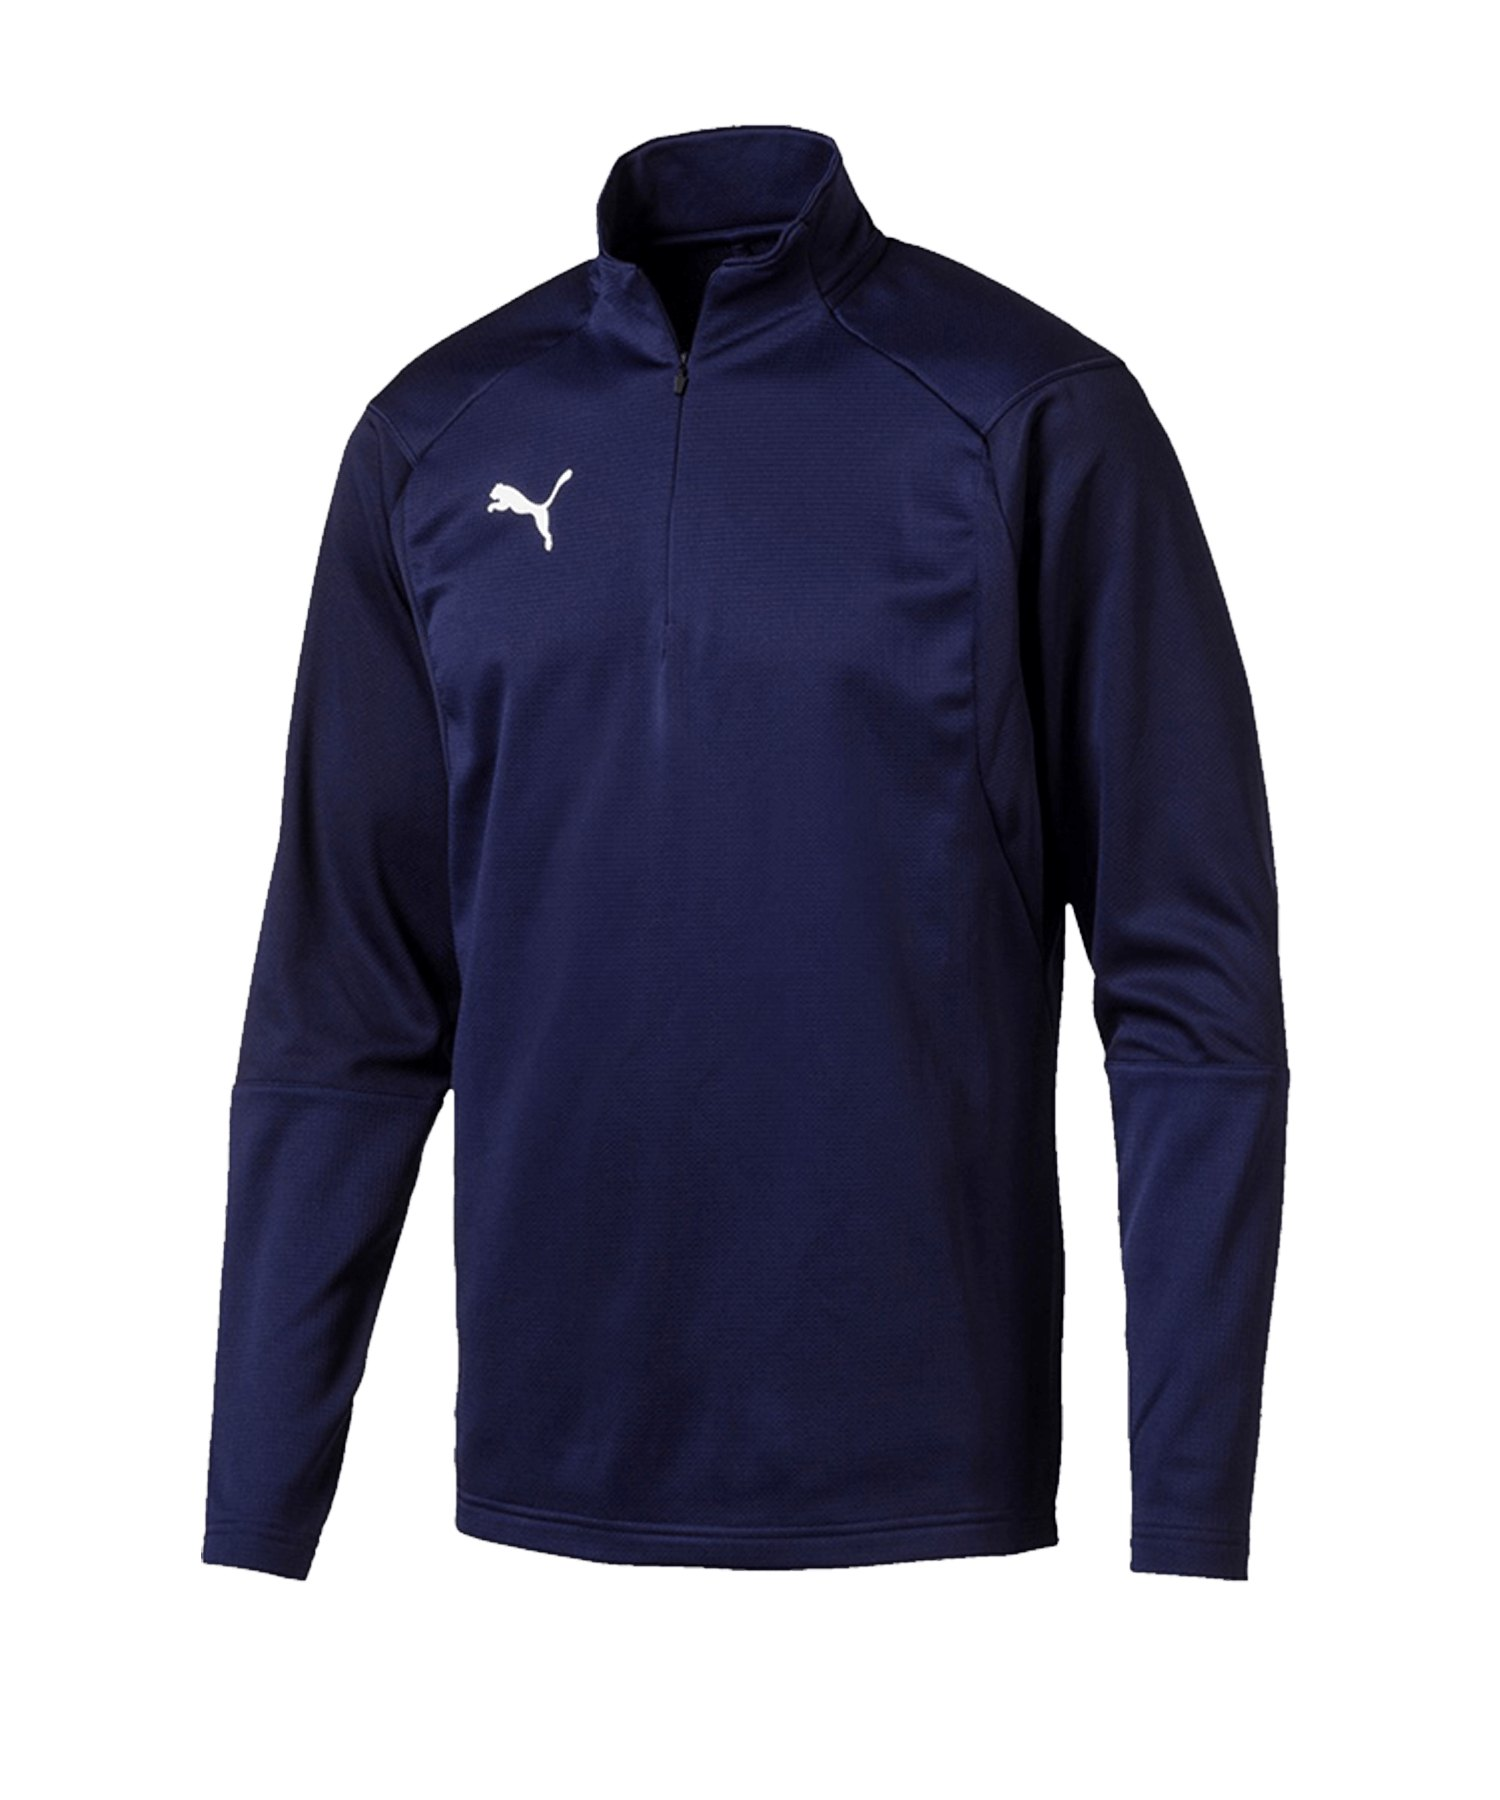 PUMA LIGA Training 1/4 Zip Top Sweatshirt Blau F06 - blau